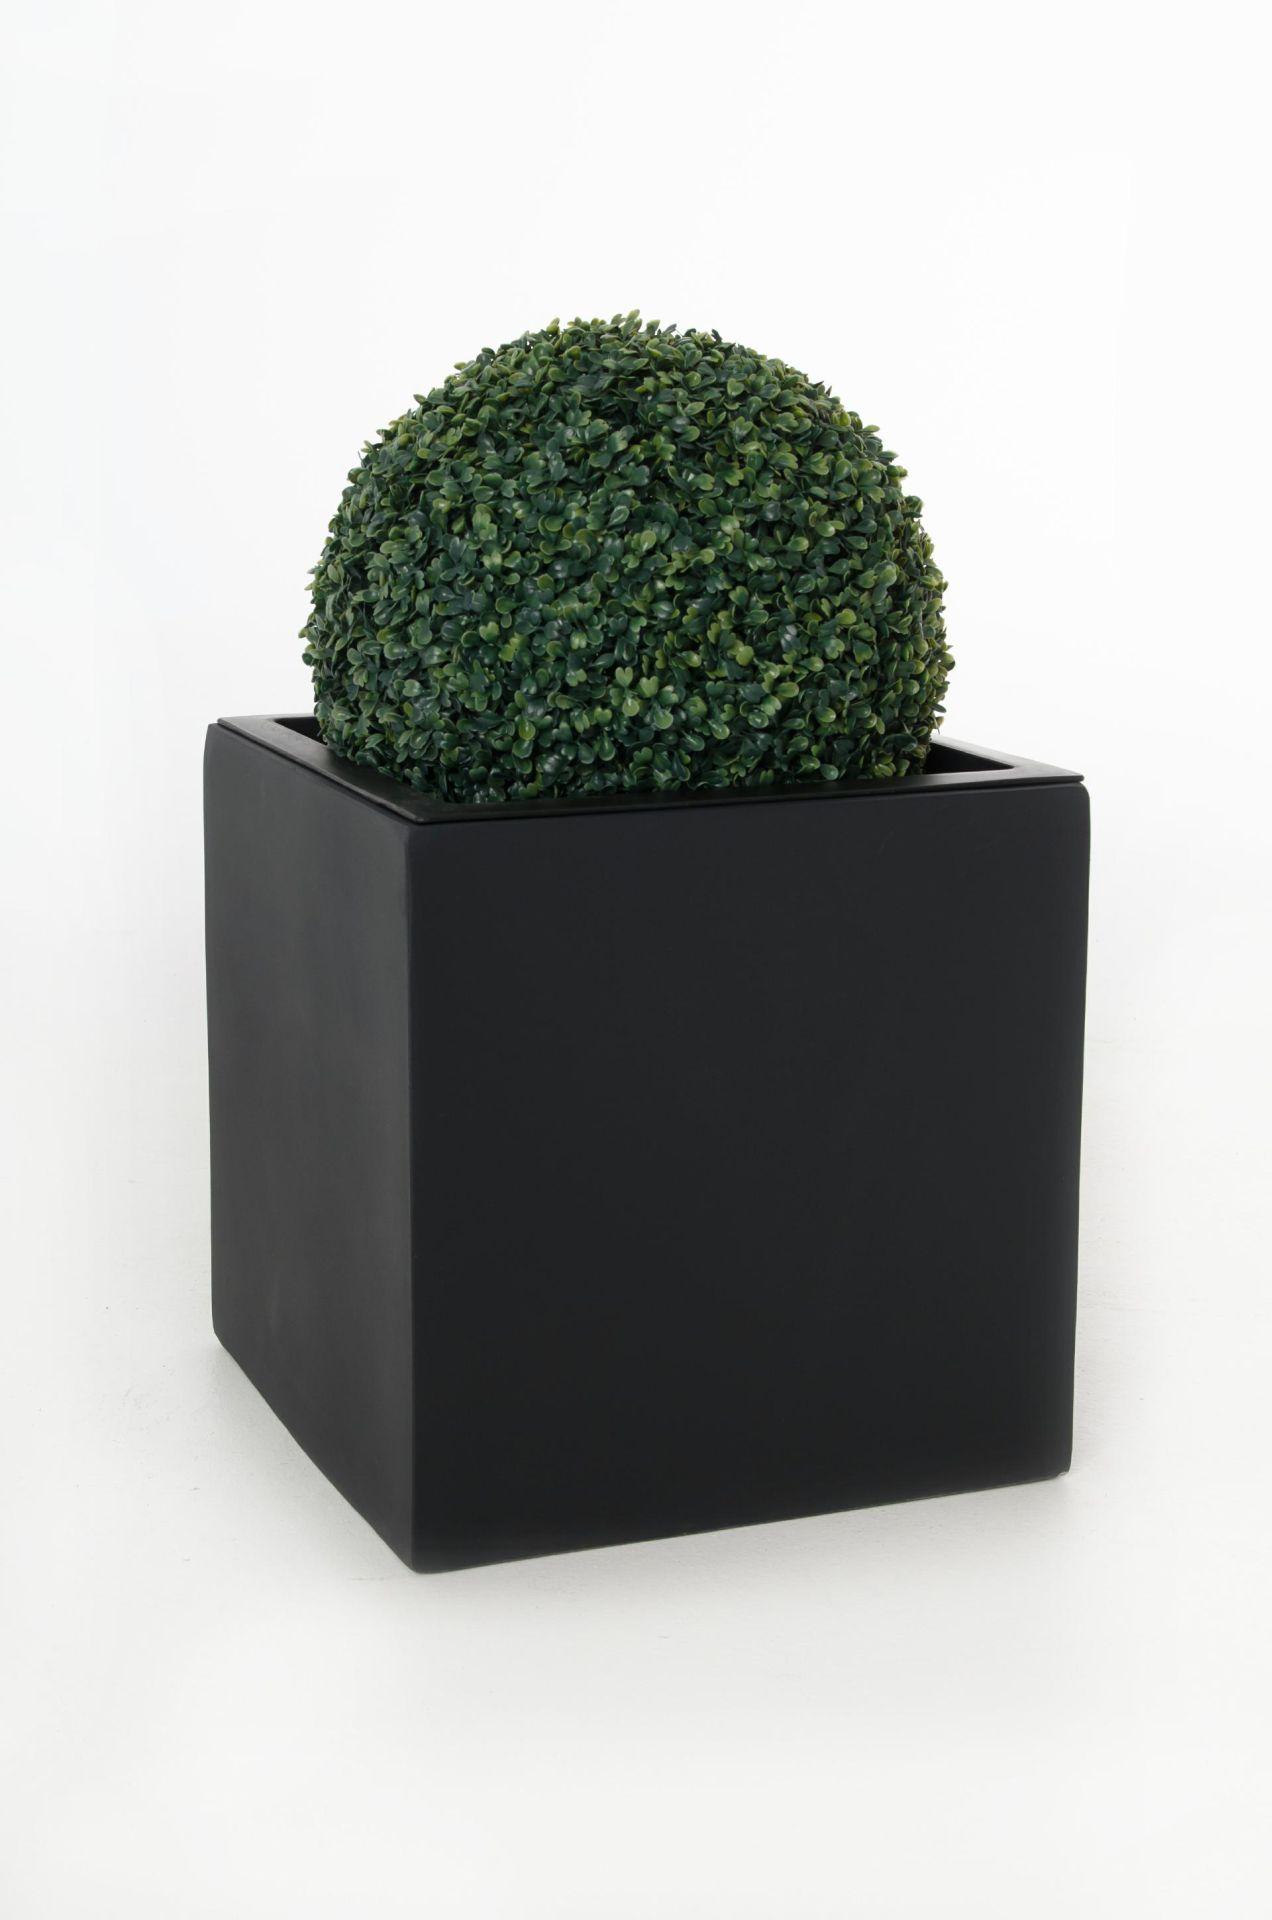 blumenk bel pflanzk bel pflanzgef e aus fiberglas block weiss 50x50x50cm ebay. Black Bedroom Furniture Sets. Home Design Ideas